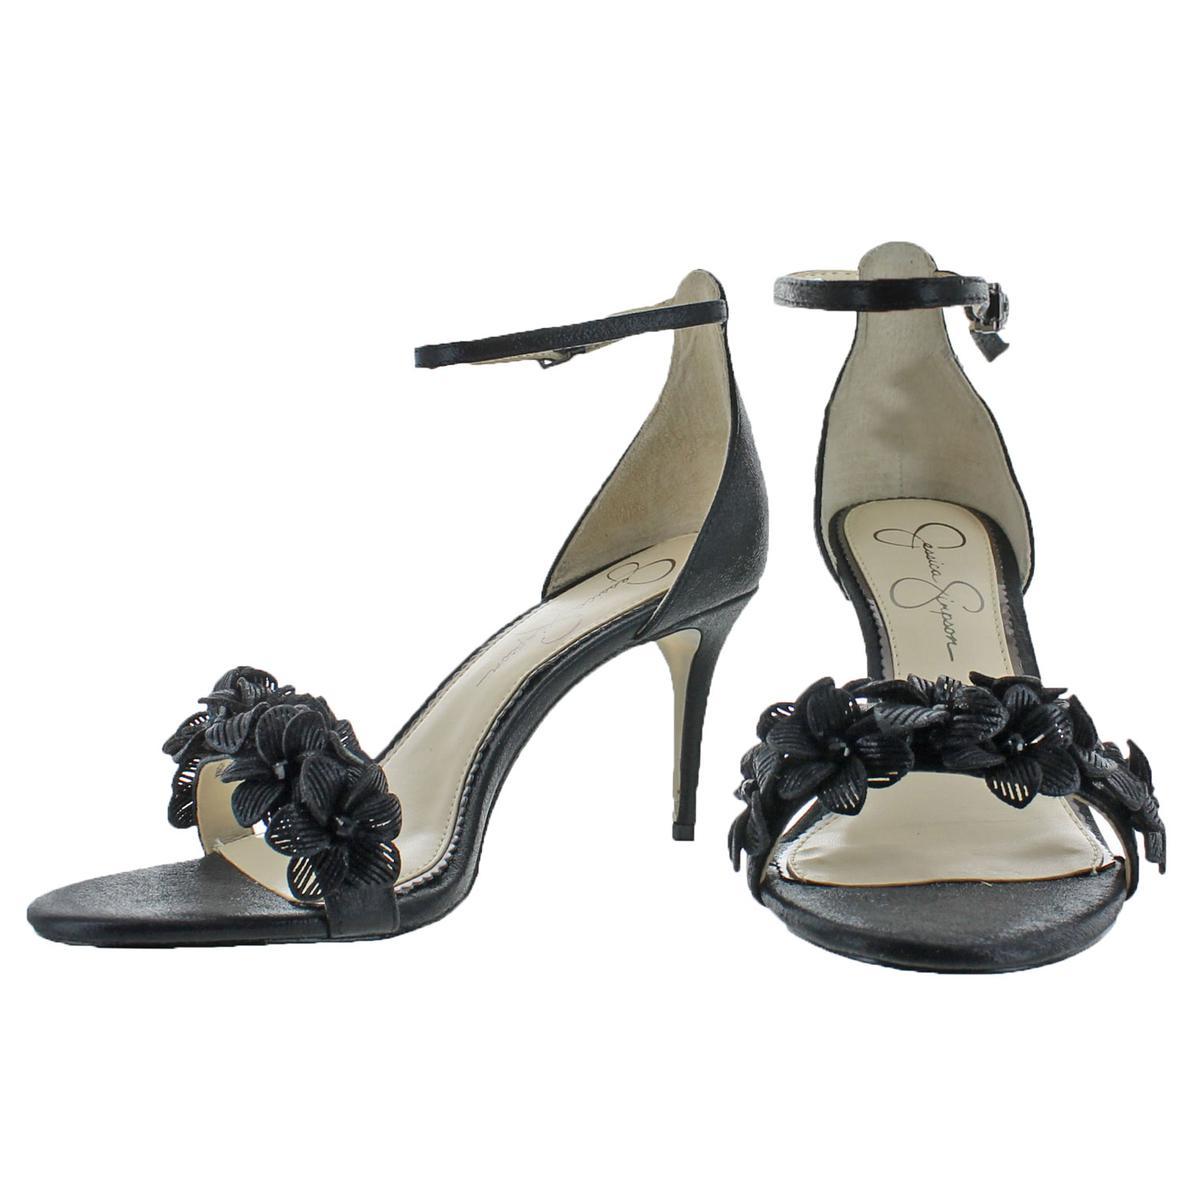 Jessica-Simpson-Pouline-Women-039-s-Shimmer-Floral-Heeled-Sandal-Buckle-Shoes thumbnail 4